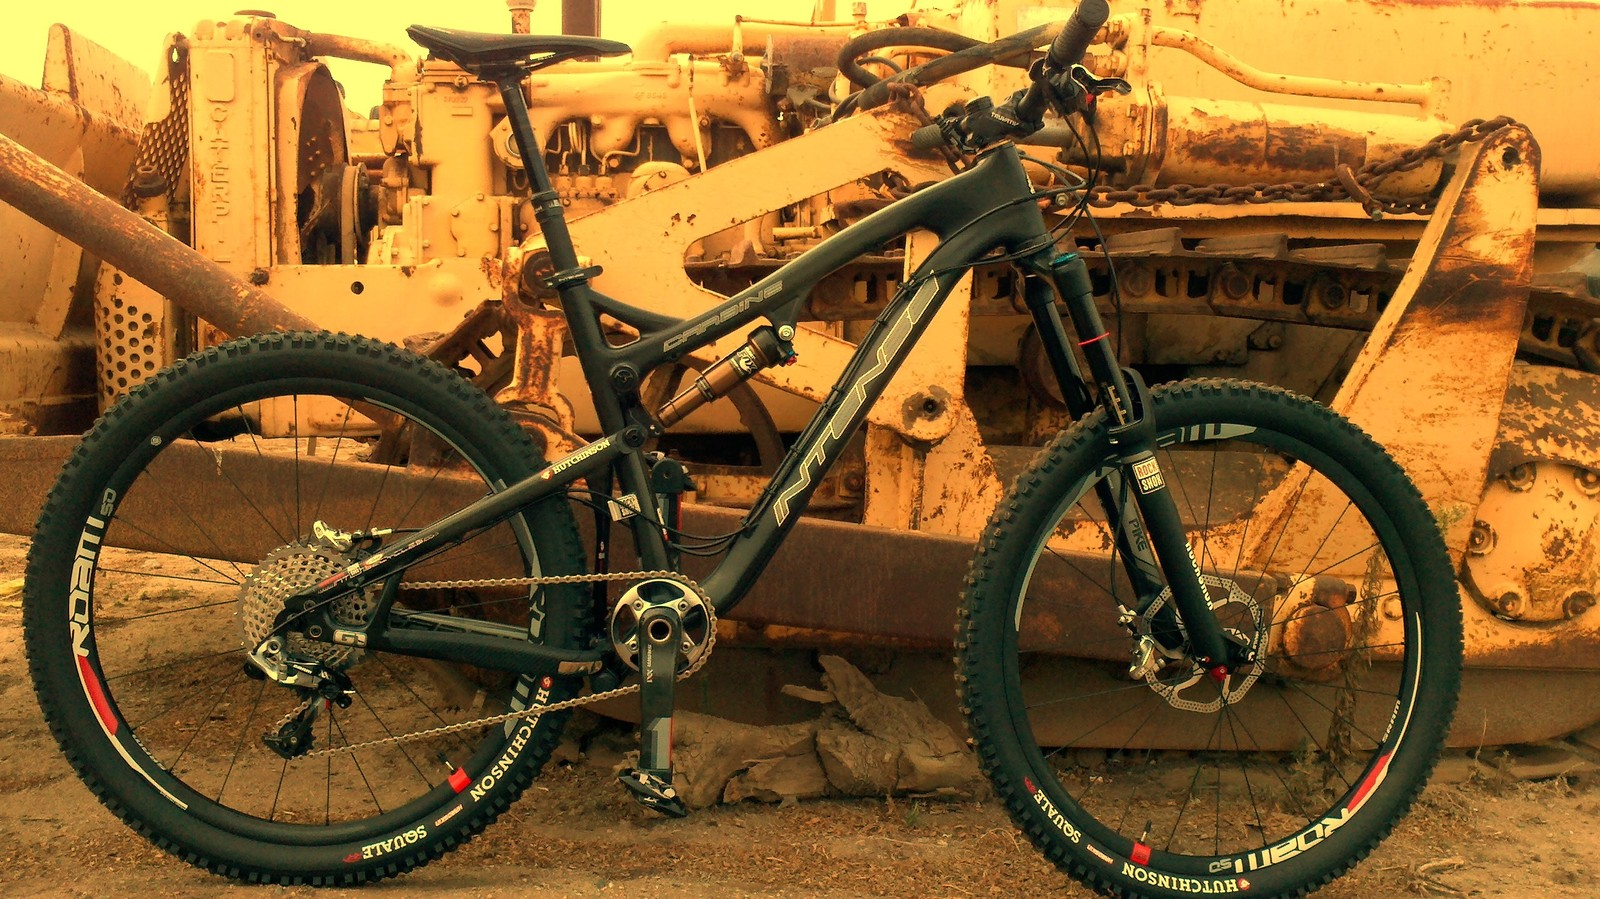 Intense Bombers Carbine SRAM Bike - ozzer - Mountain Biking Pictures - Vital MTB